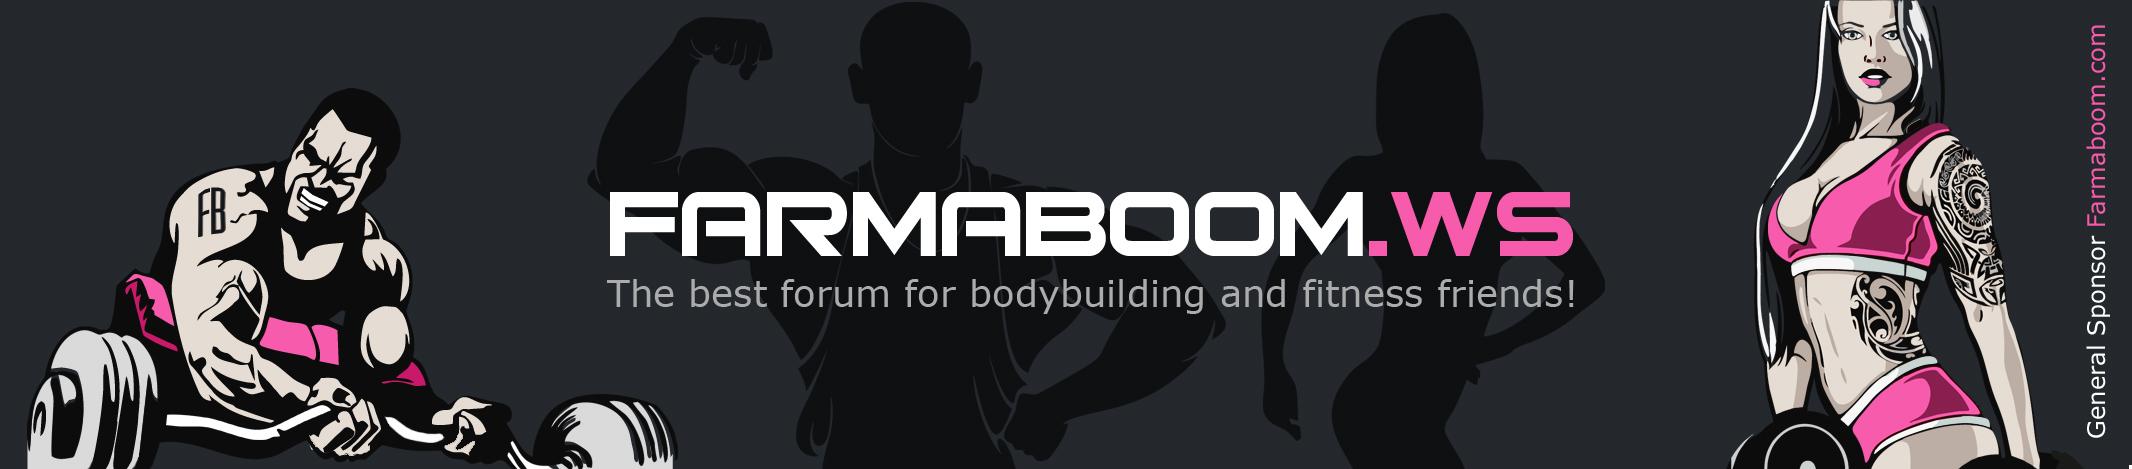 farmaboom.ws